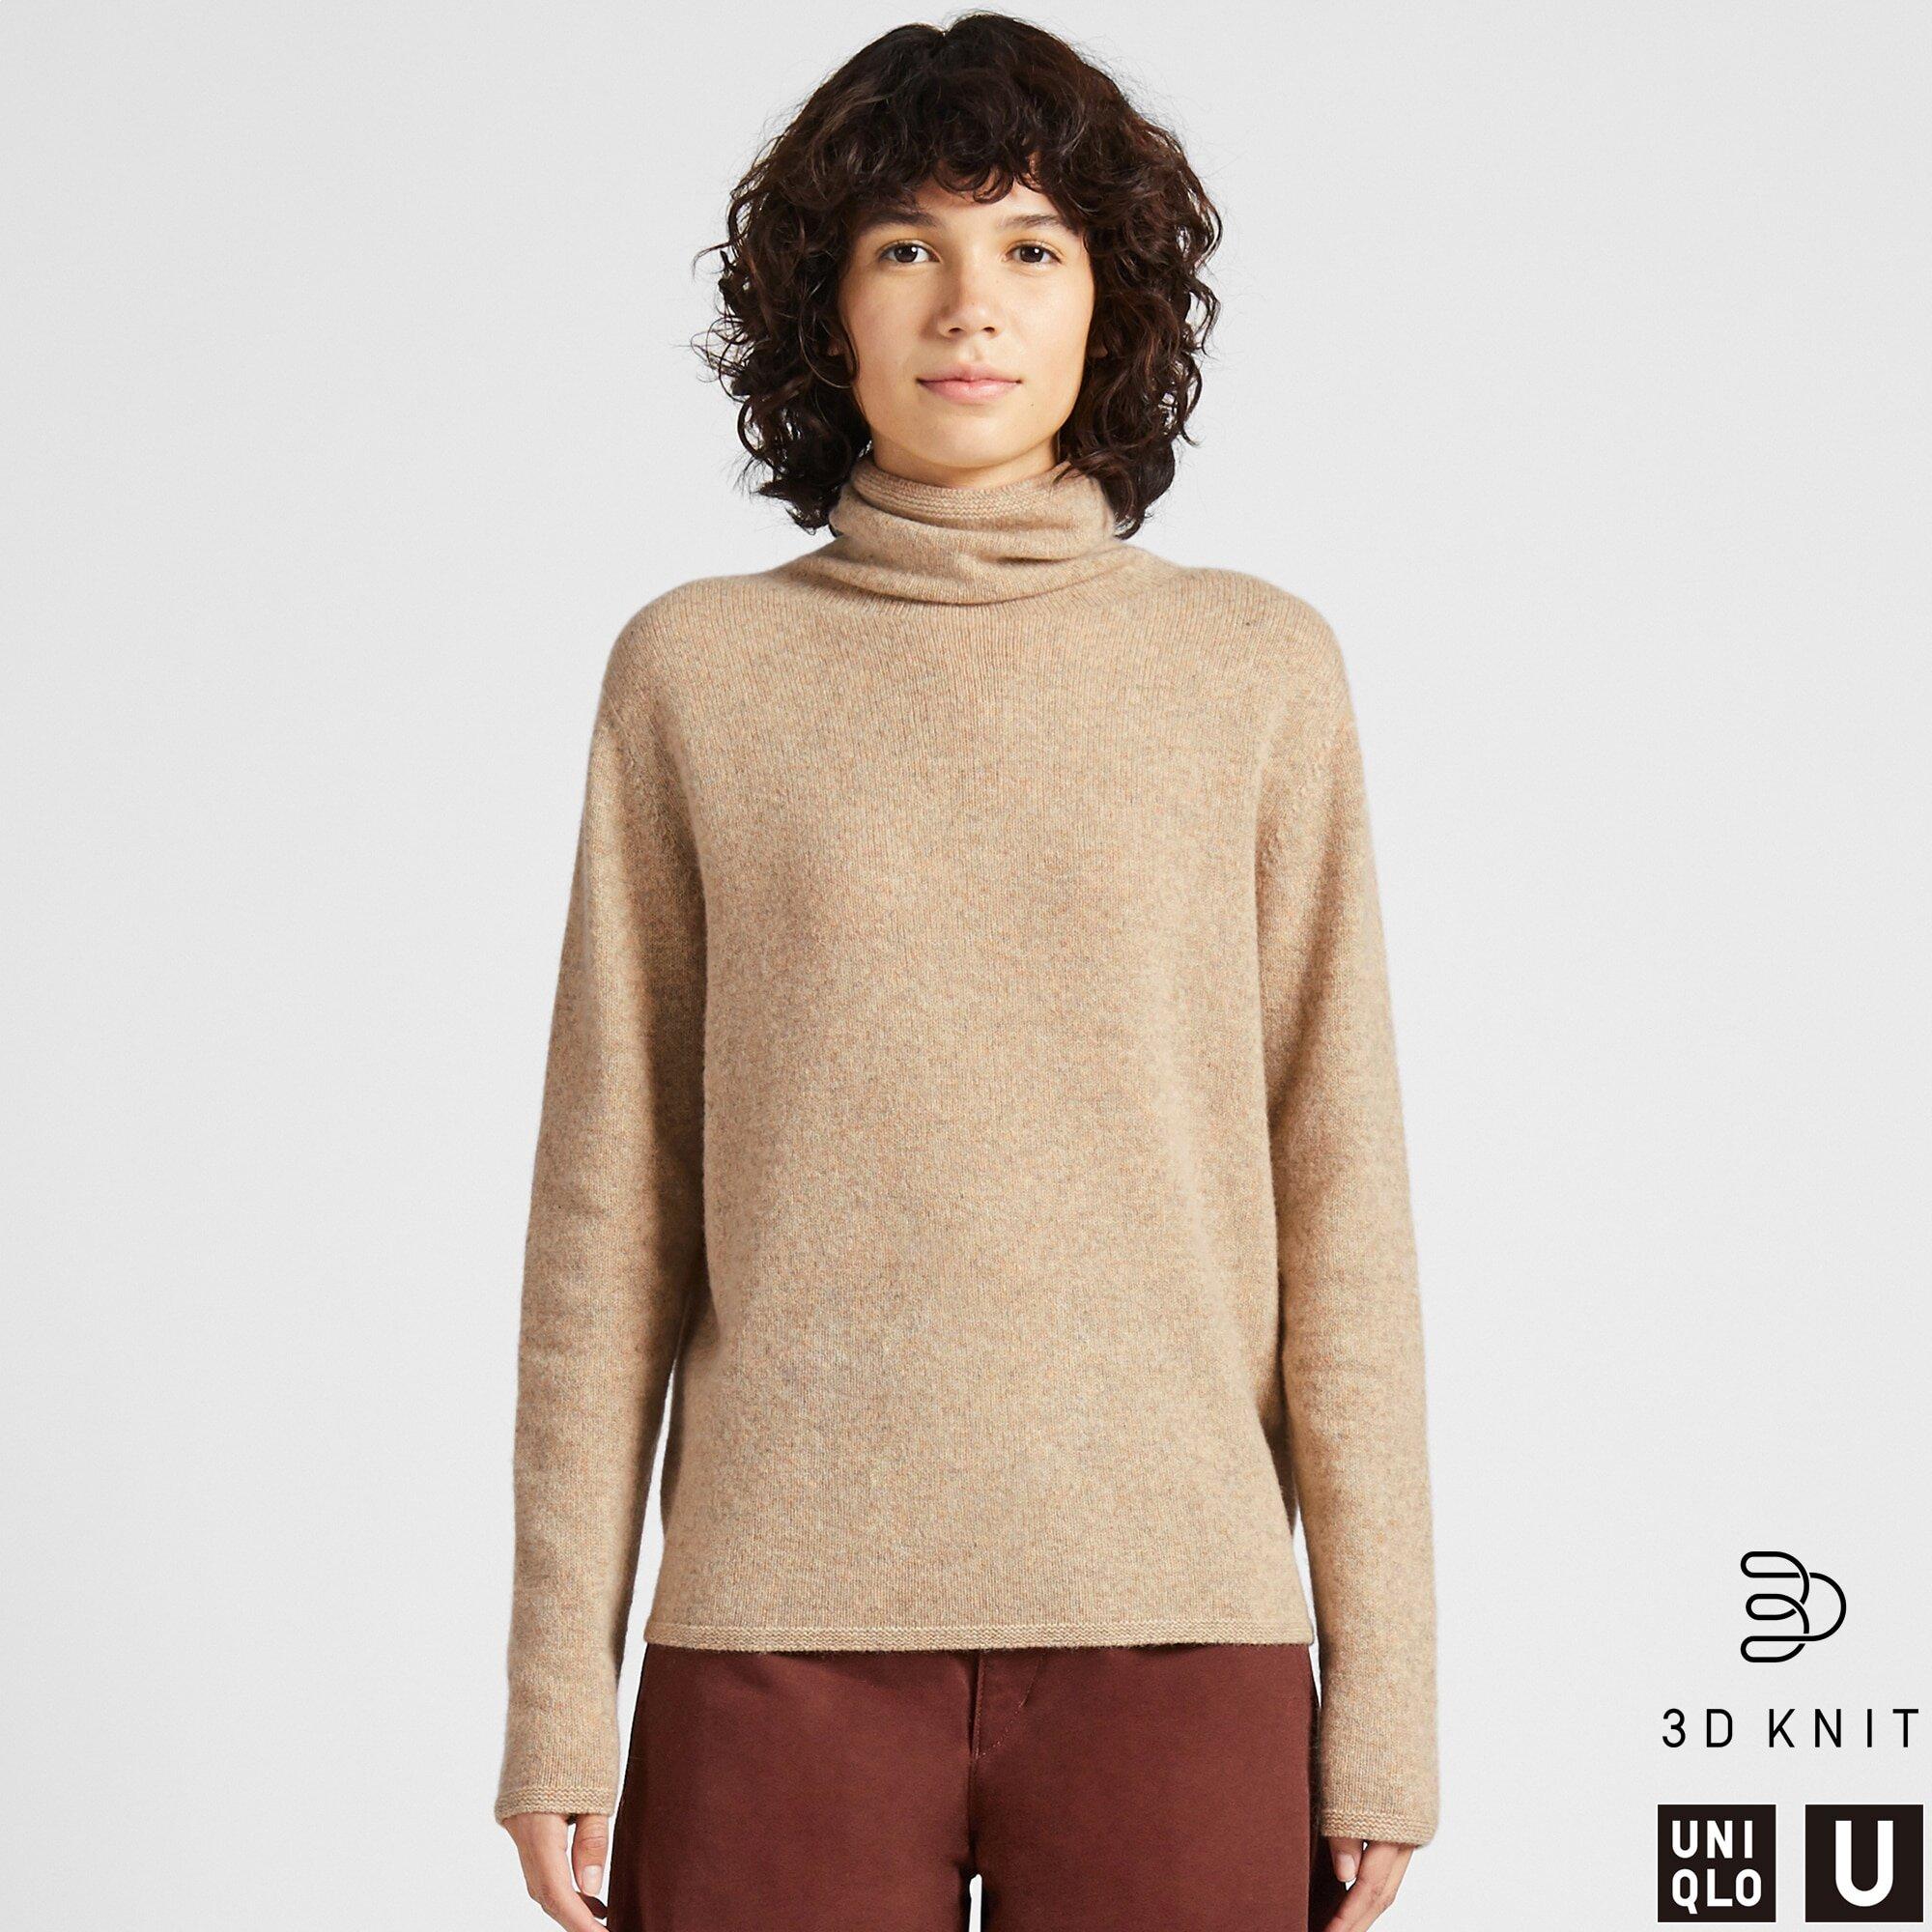 Pull en laine - Uniqlo